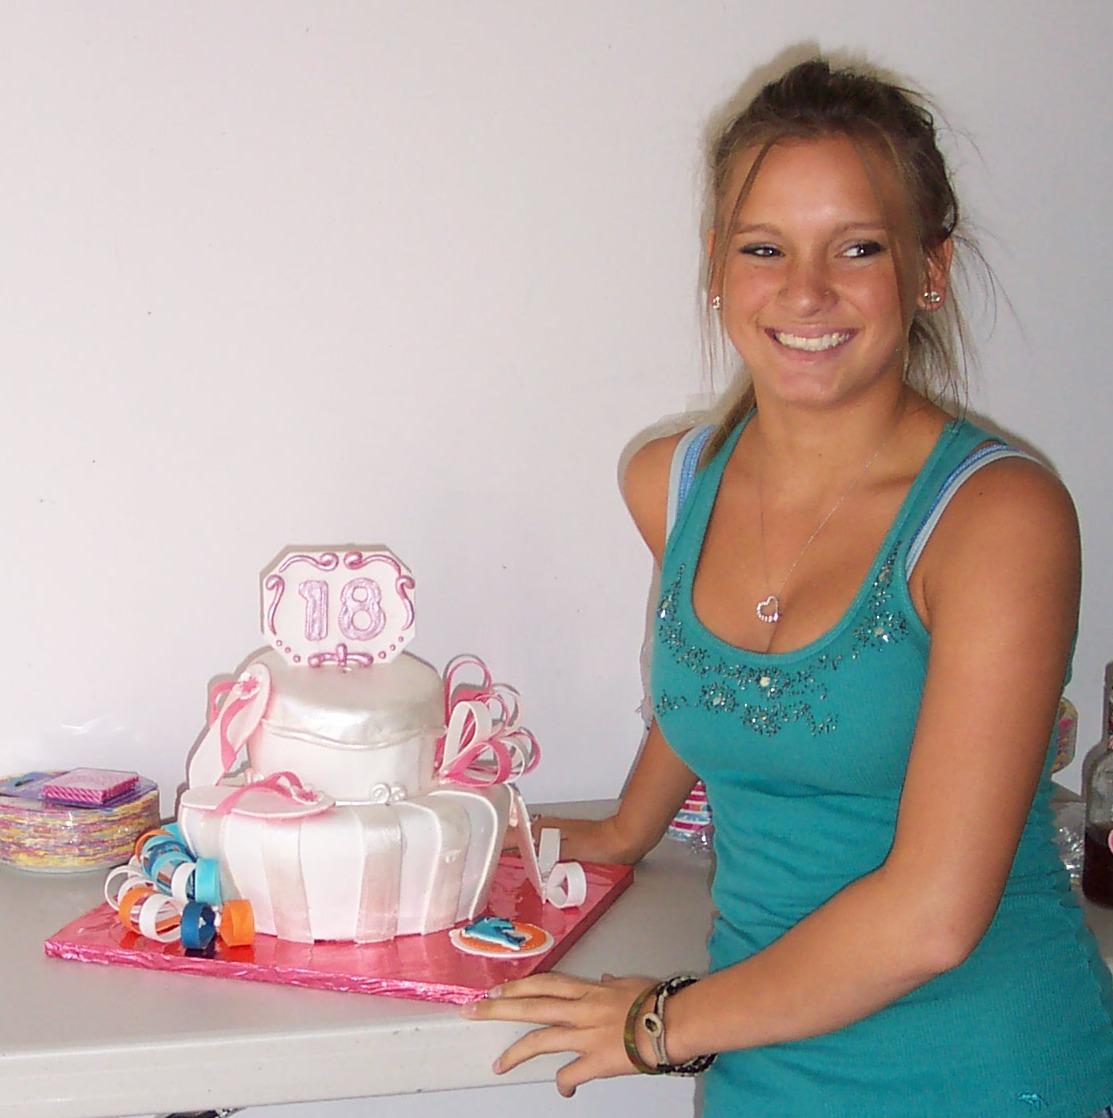 Samantha With Her Miami Dolphin Cheerleader Birthday Cake